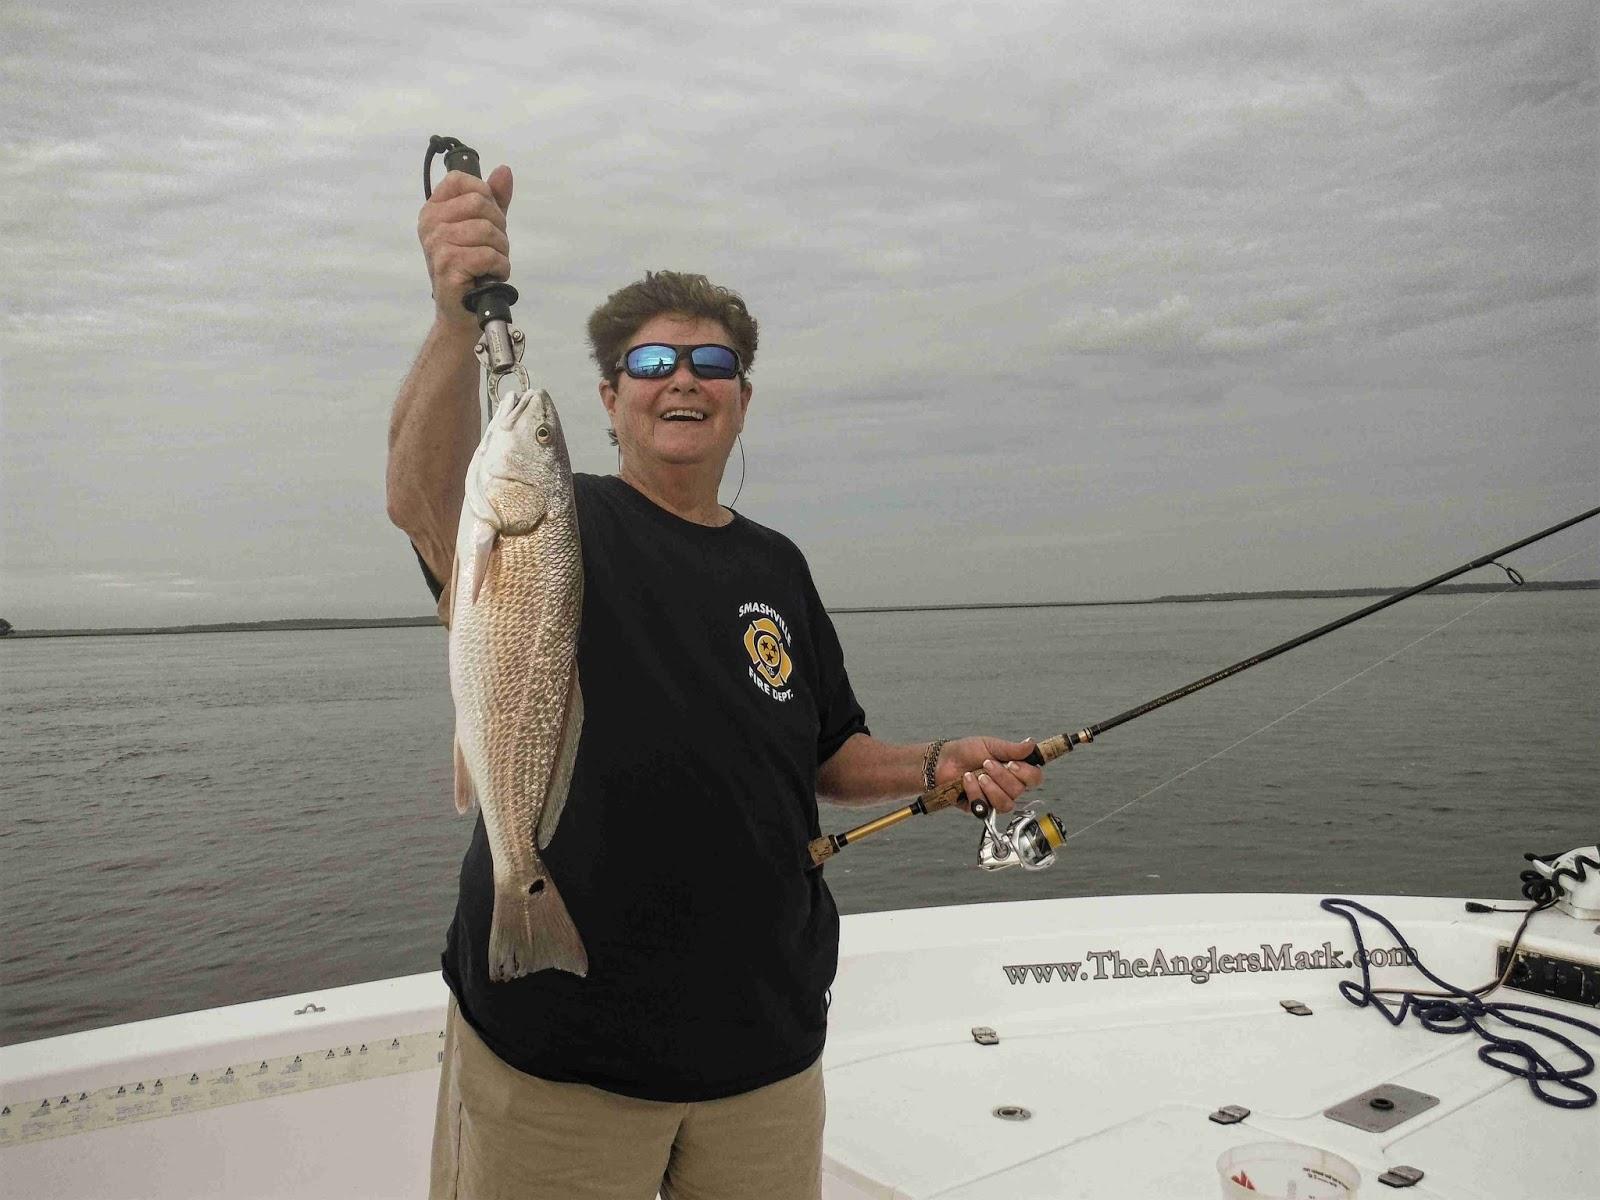 Amelia island fishing reports last cast boom for Amelia island fishing report